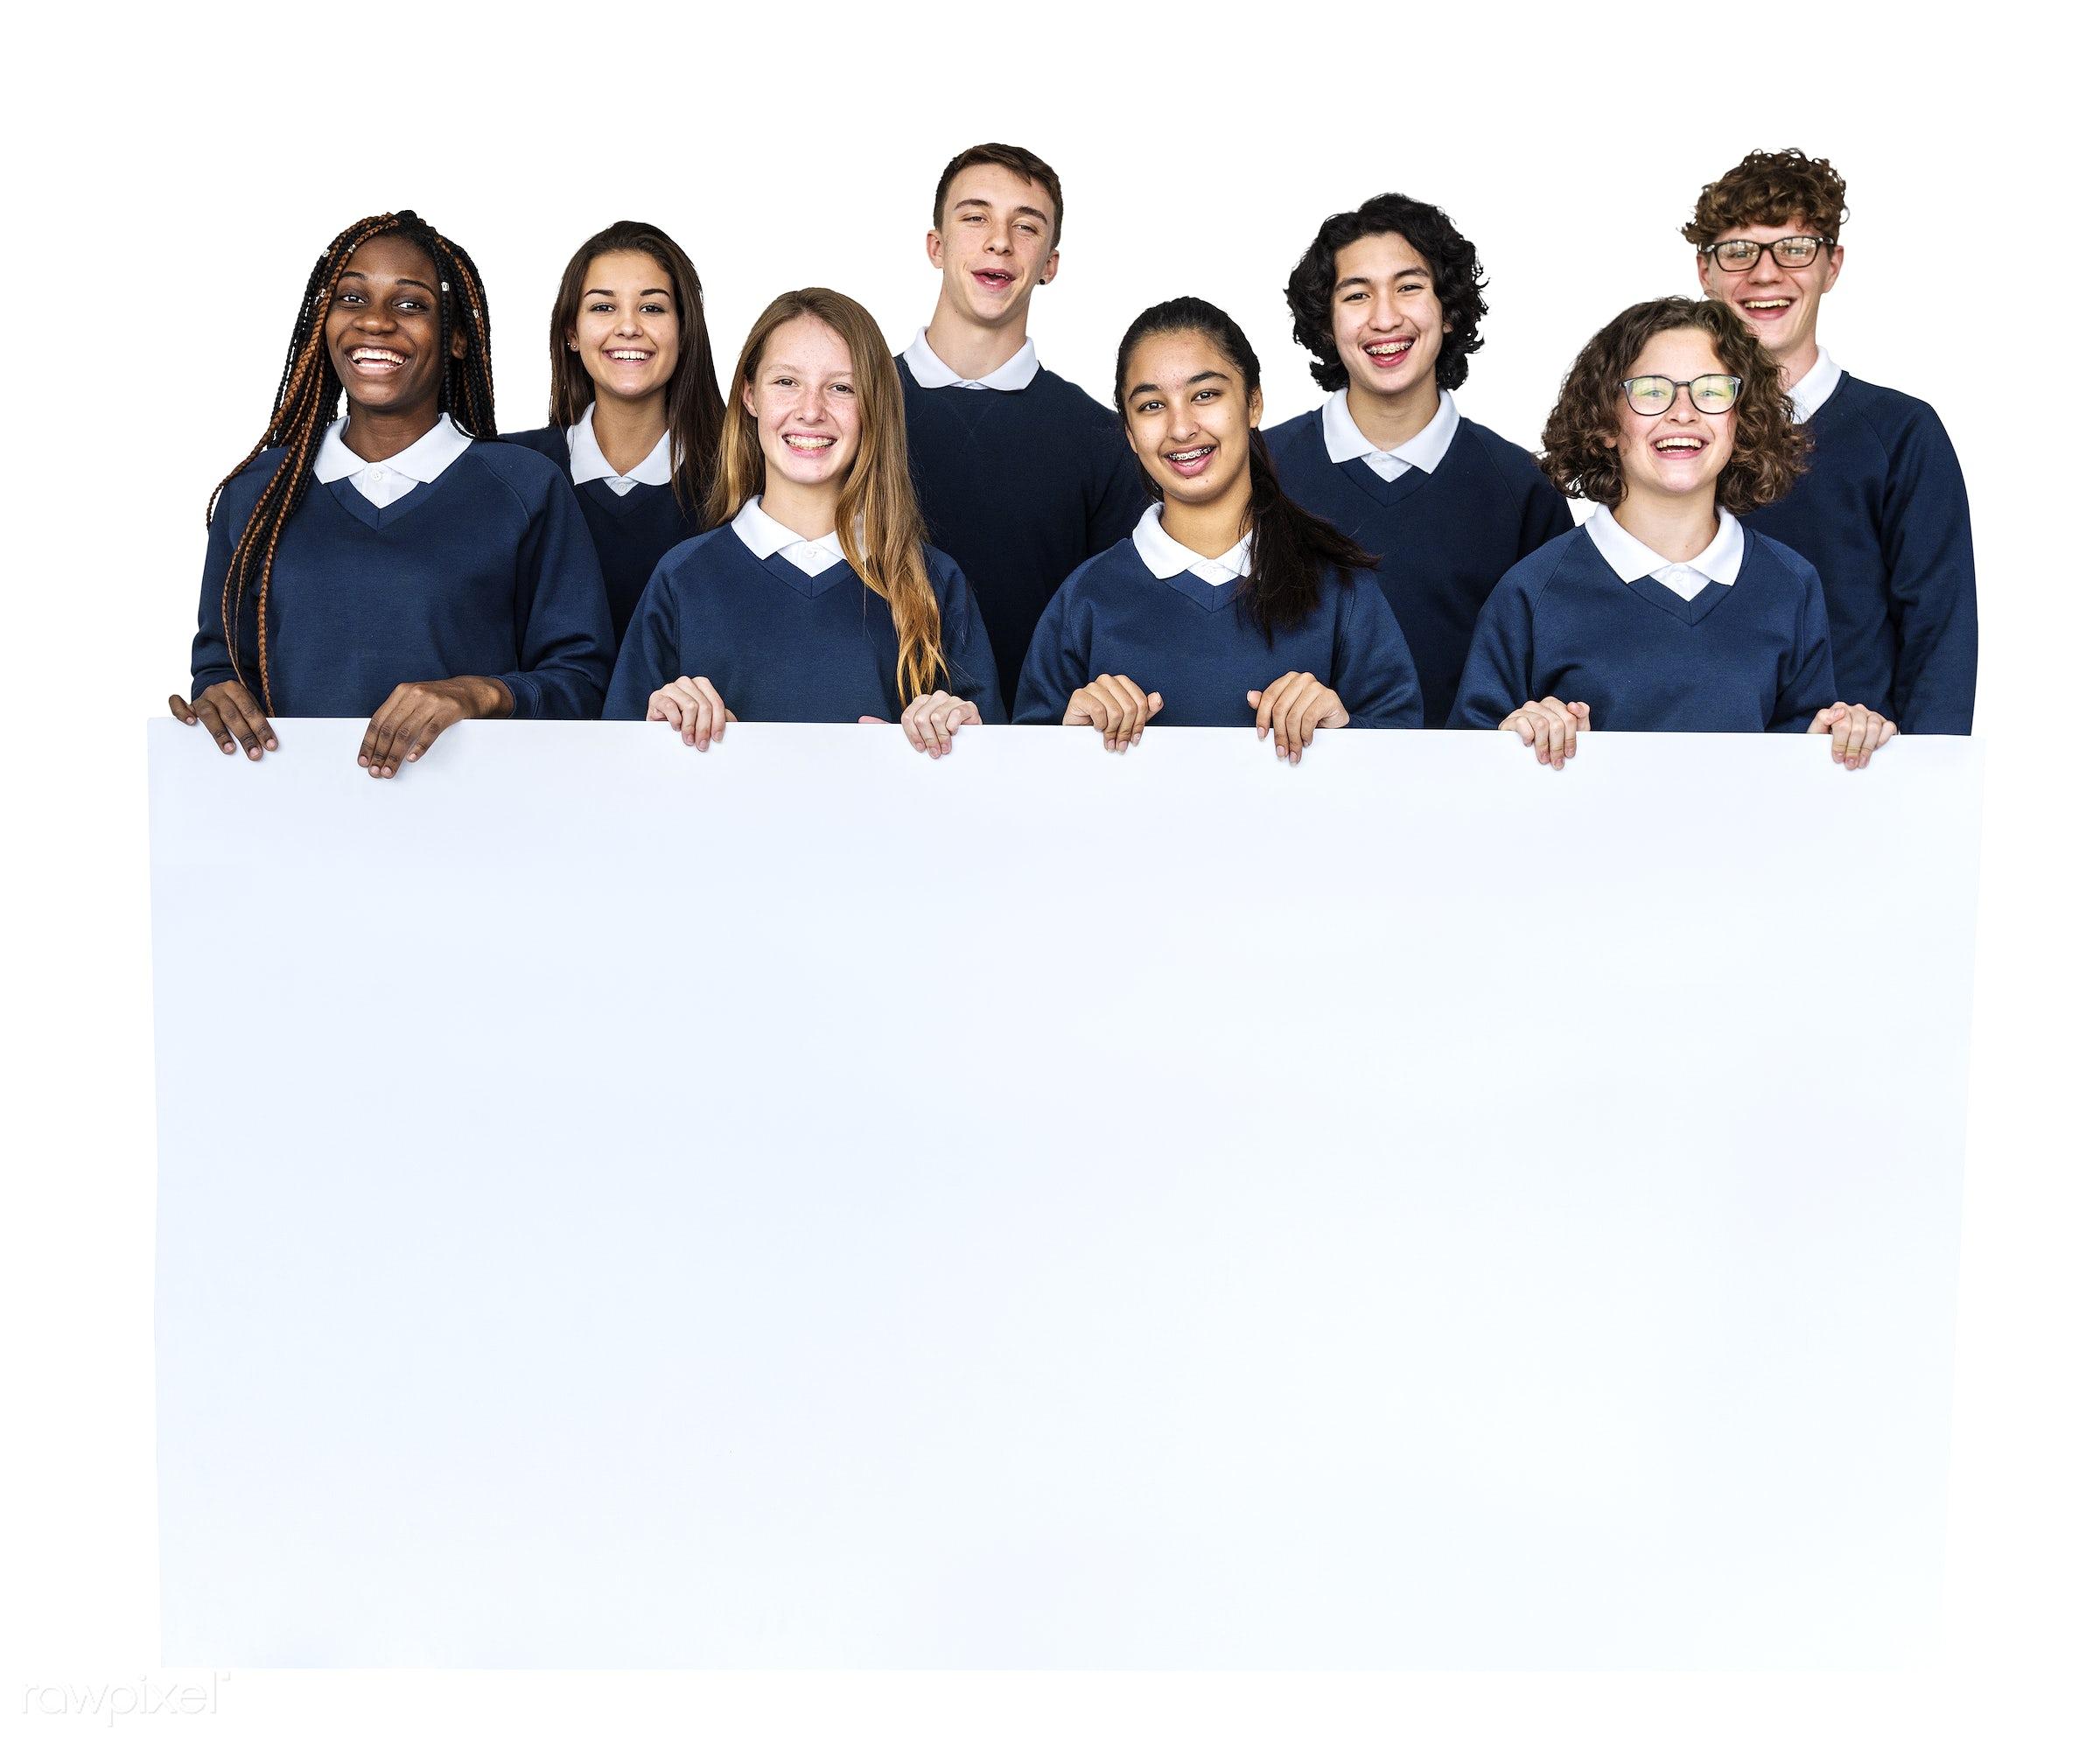 academic, balnk, classmate, college, community, connection, copy space, development, education, fellowship, friend,...